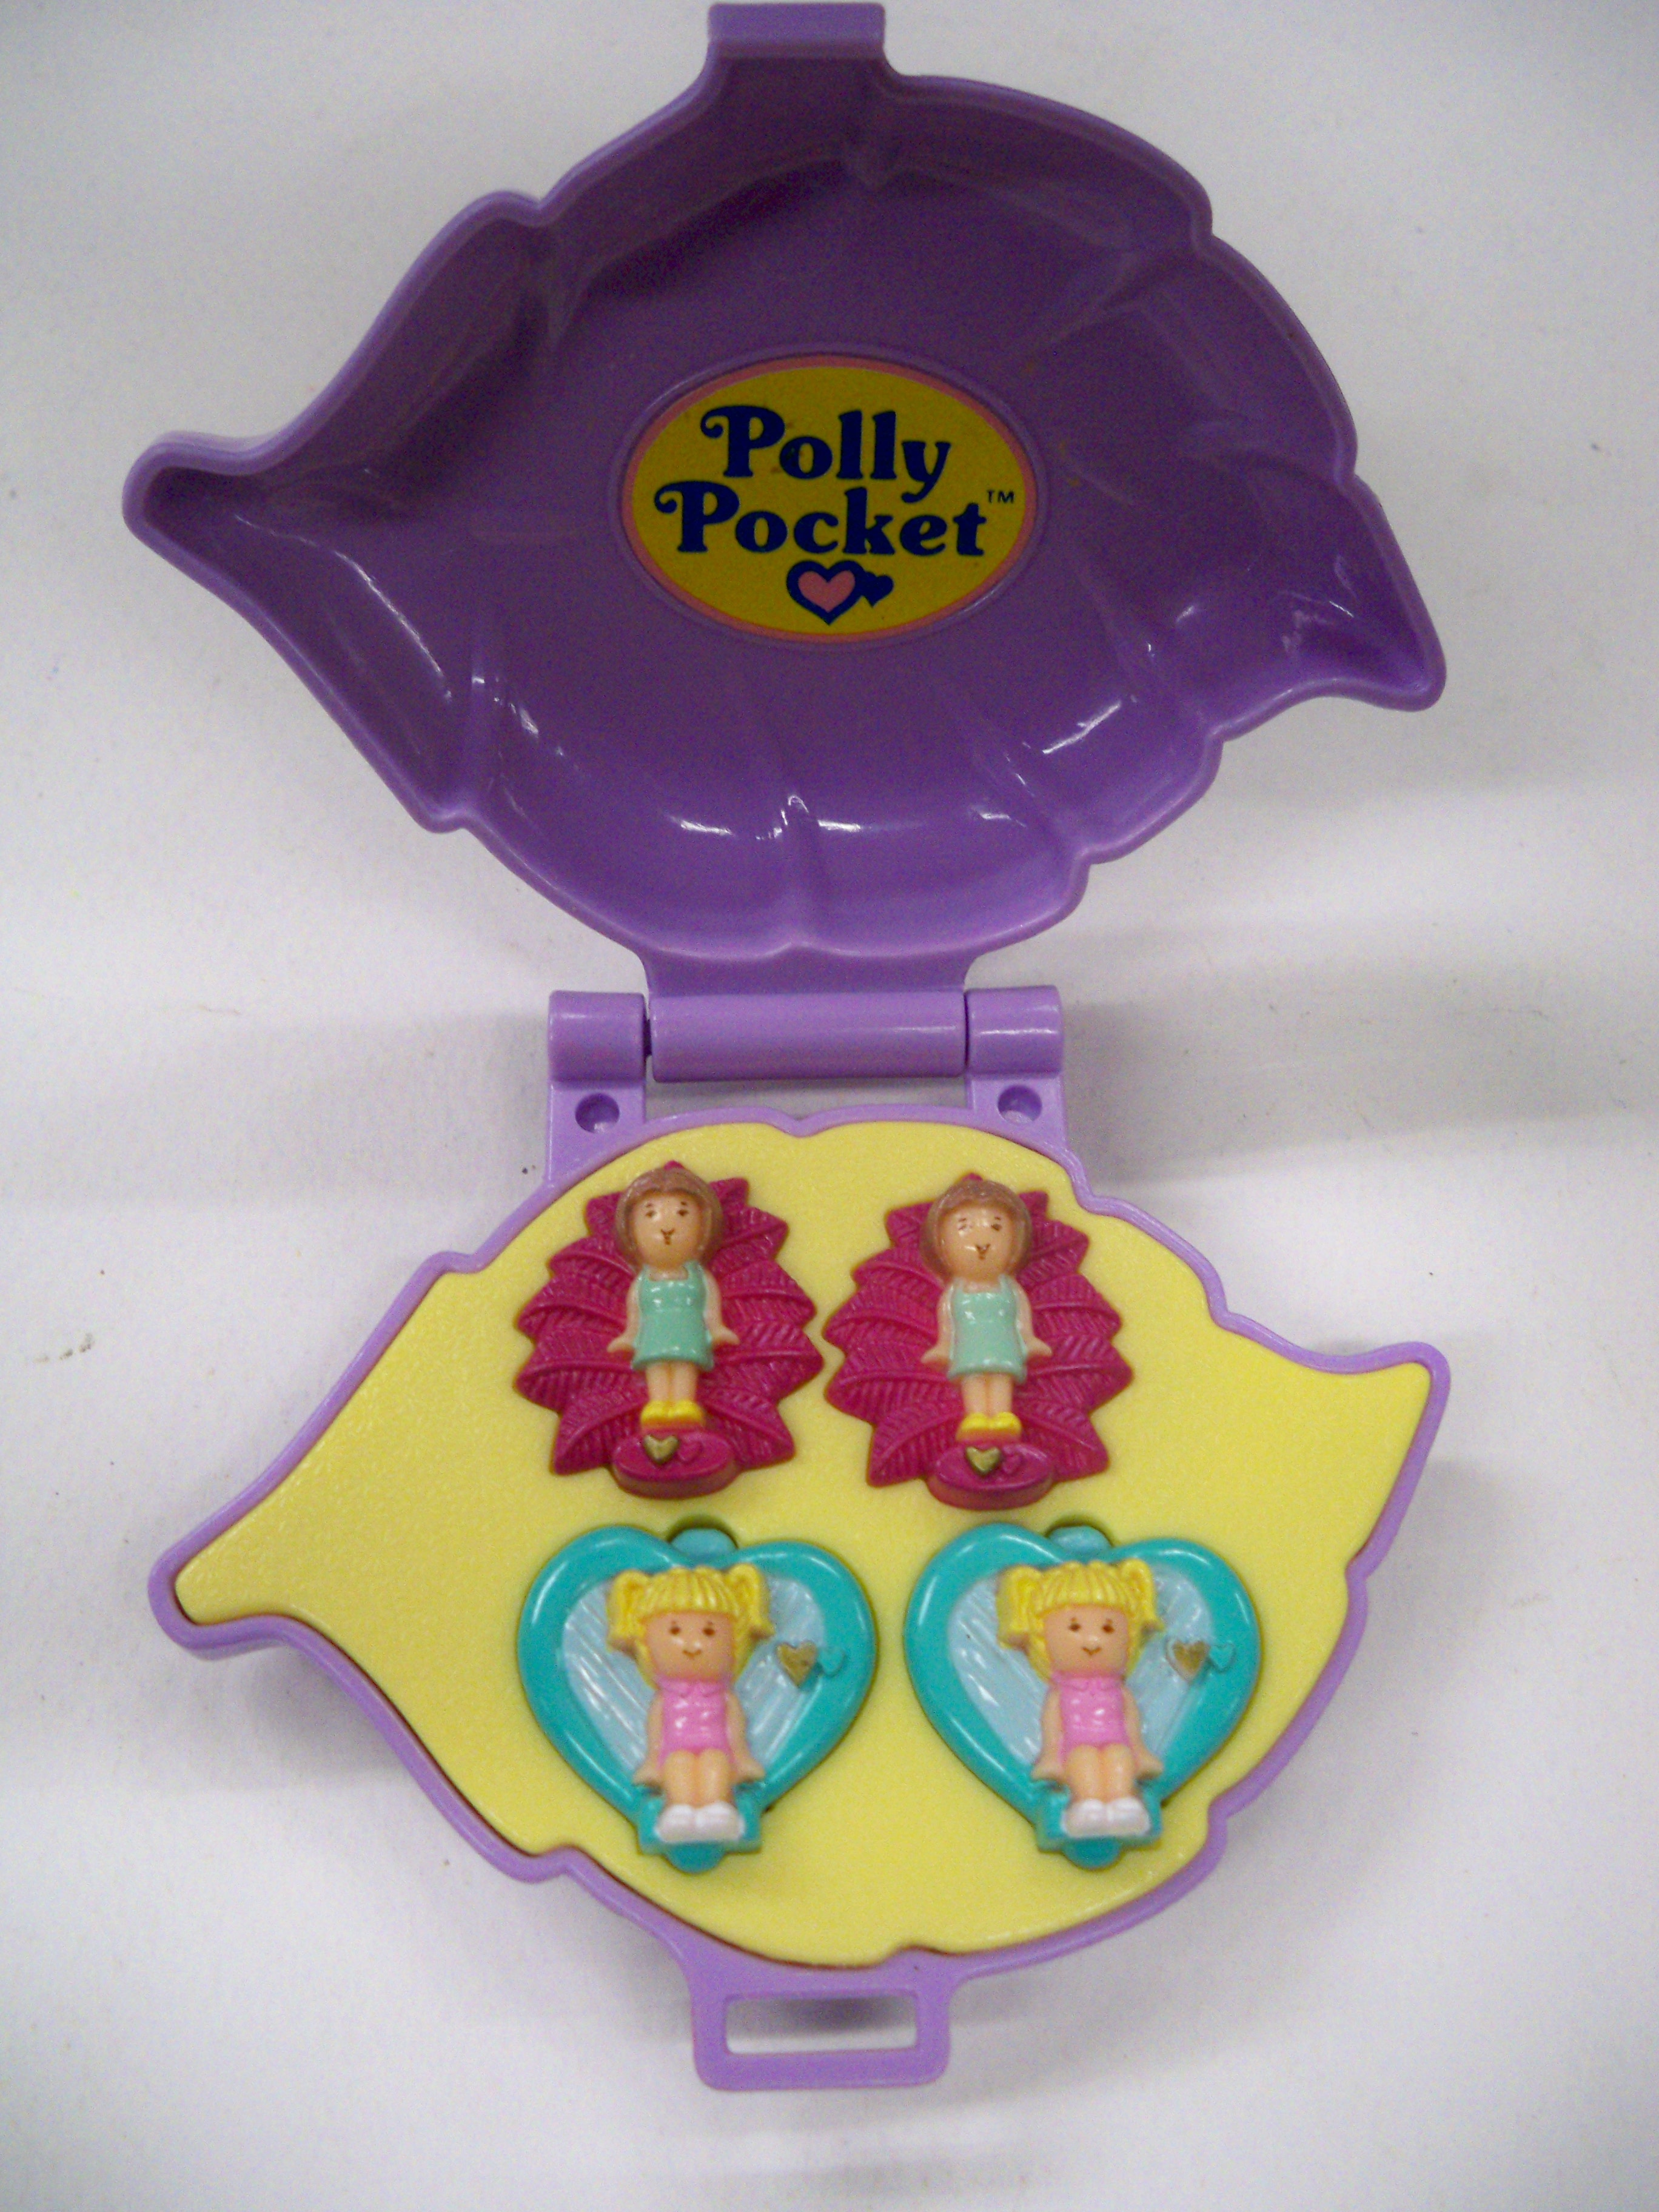 Polly ใบไม้สีม่วง